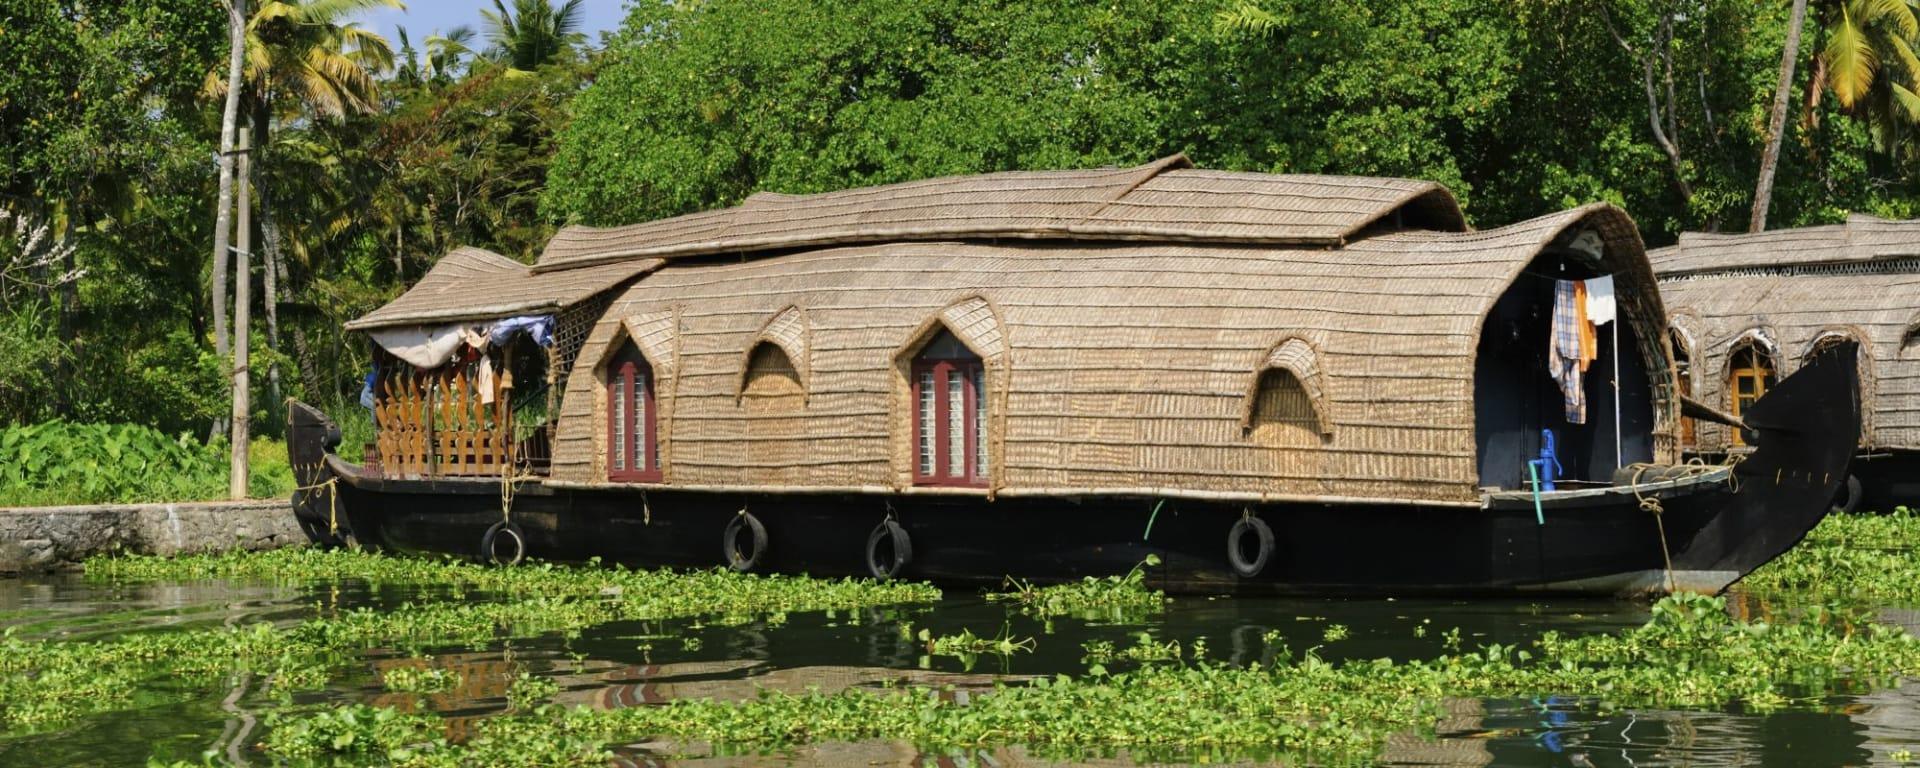 Backwaters von Kerala ab Kochi: Backwaters: House Boat